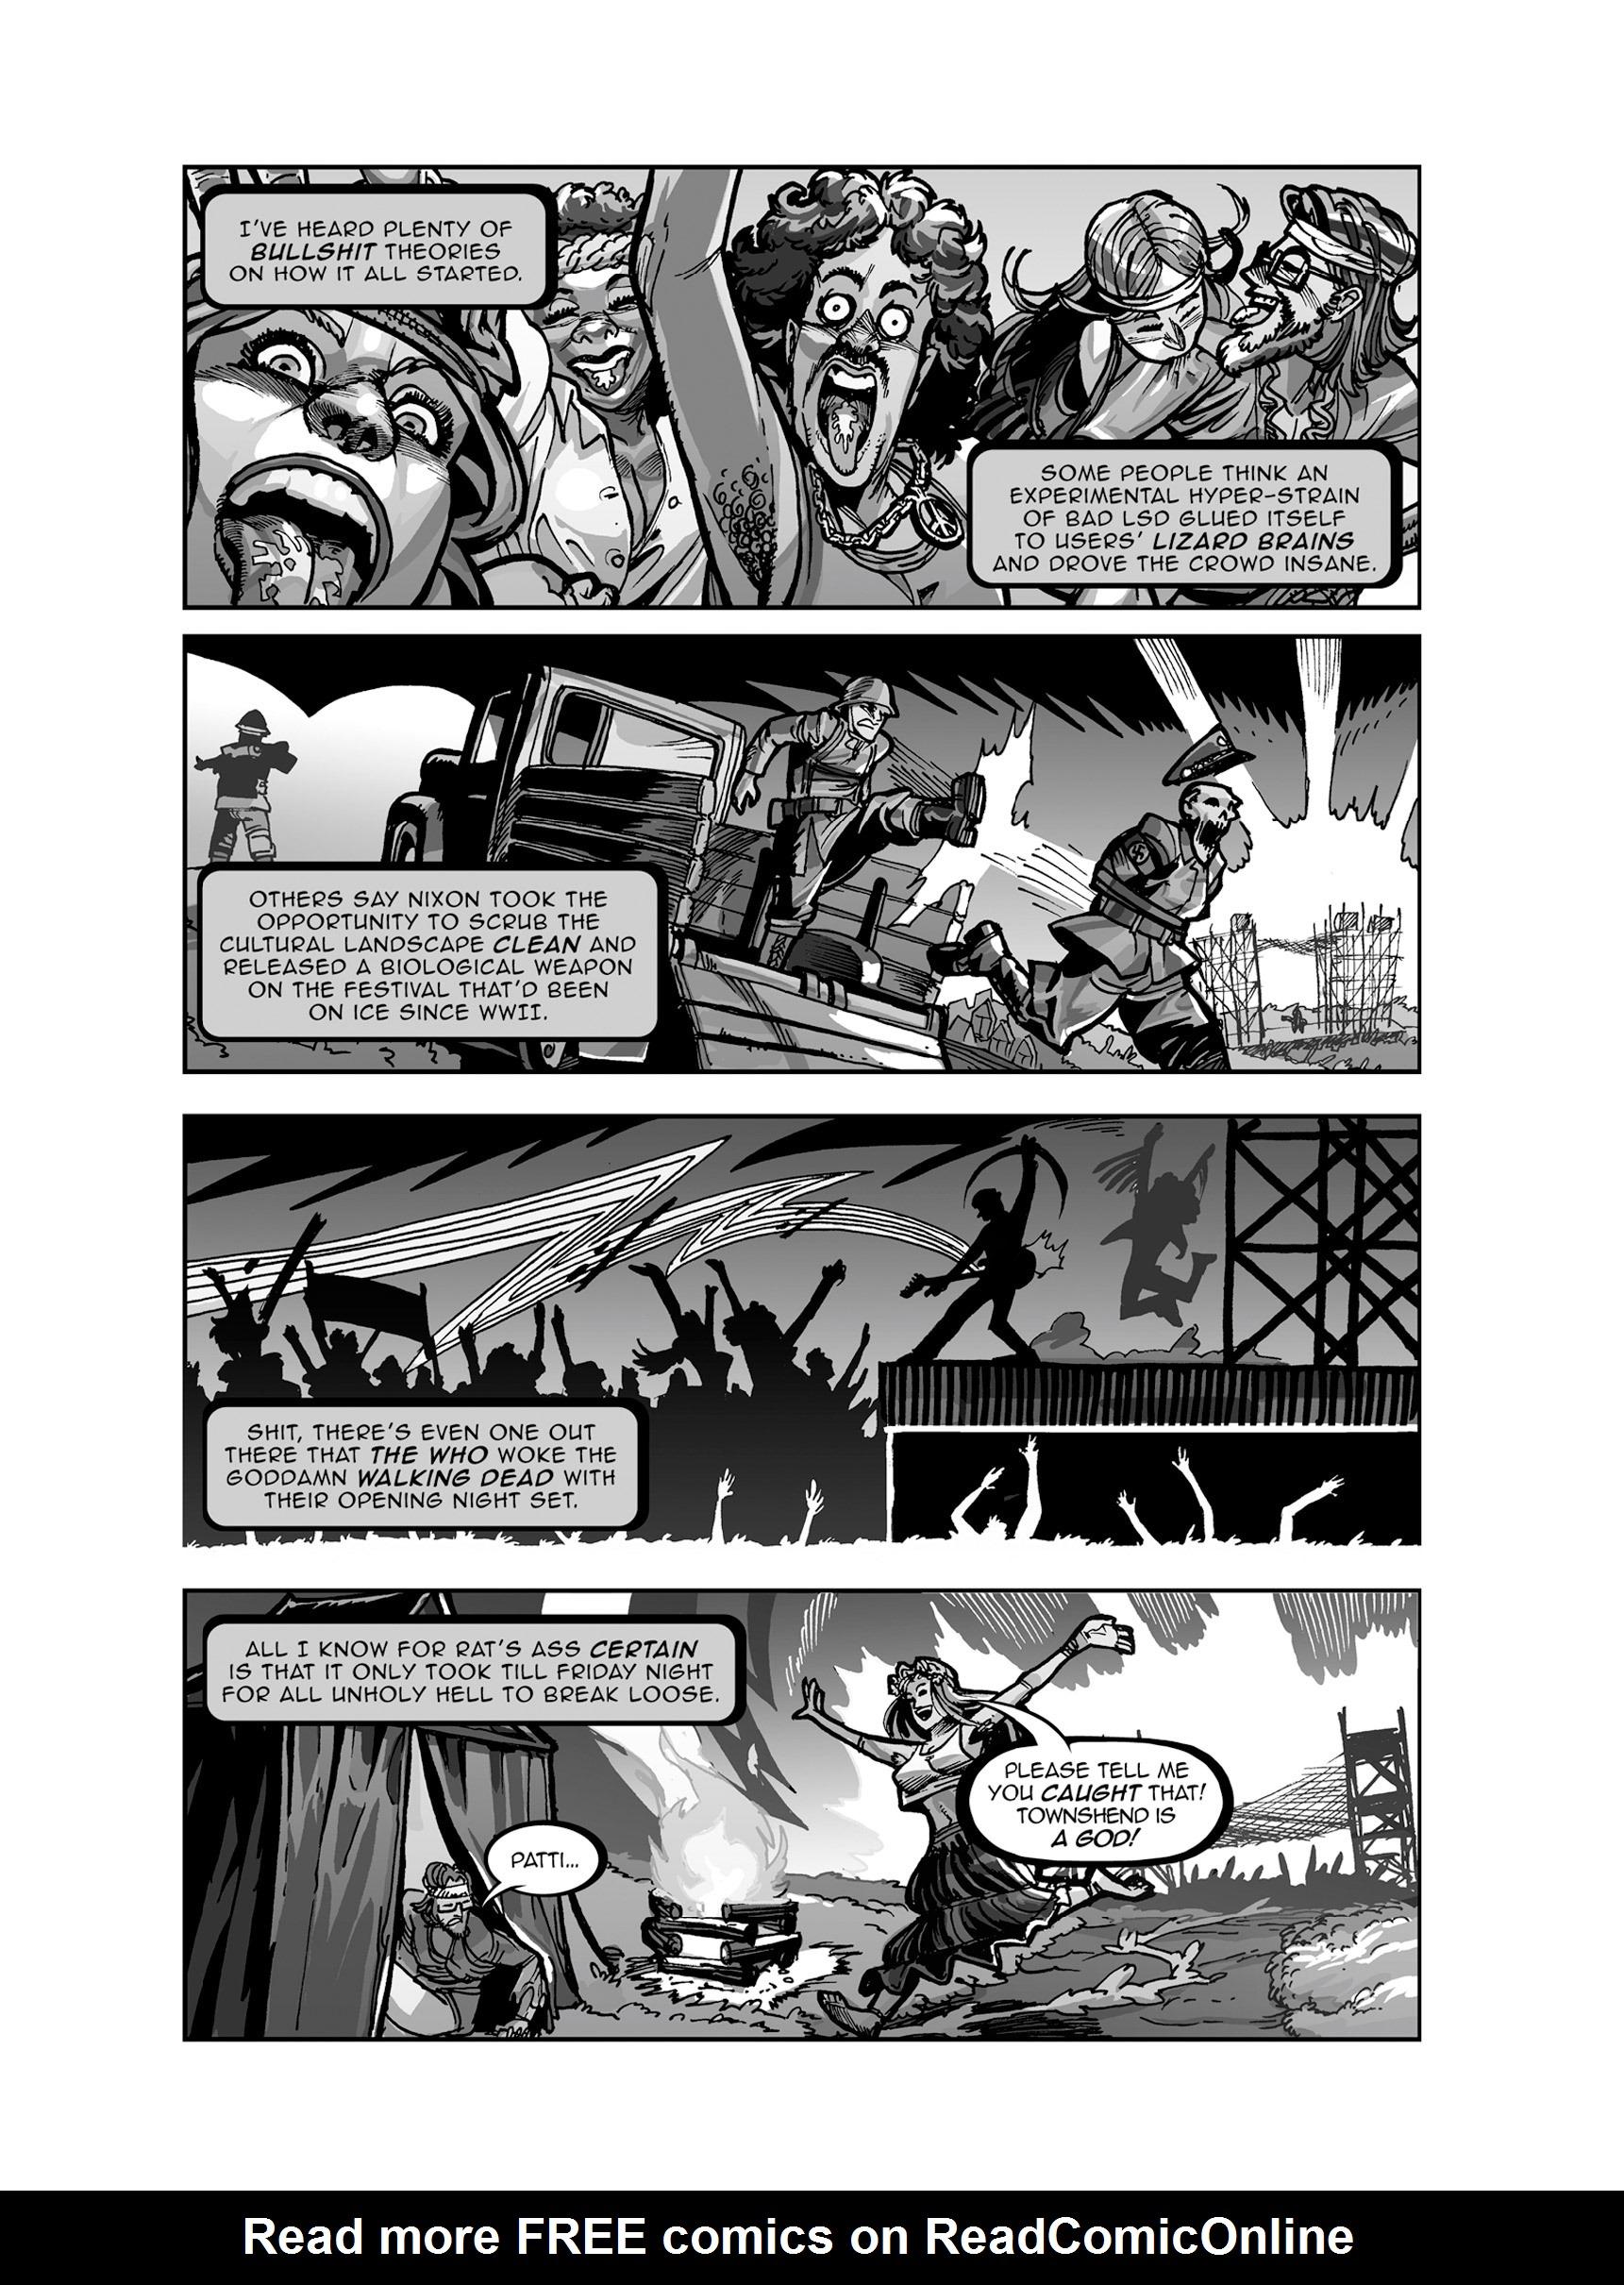 Read online FUBAR comic -  Issue #3 - 341